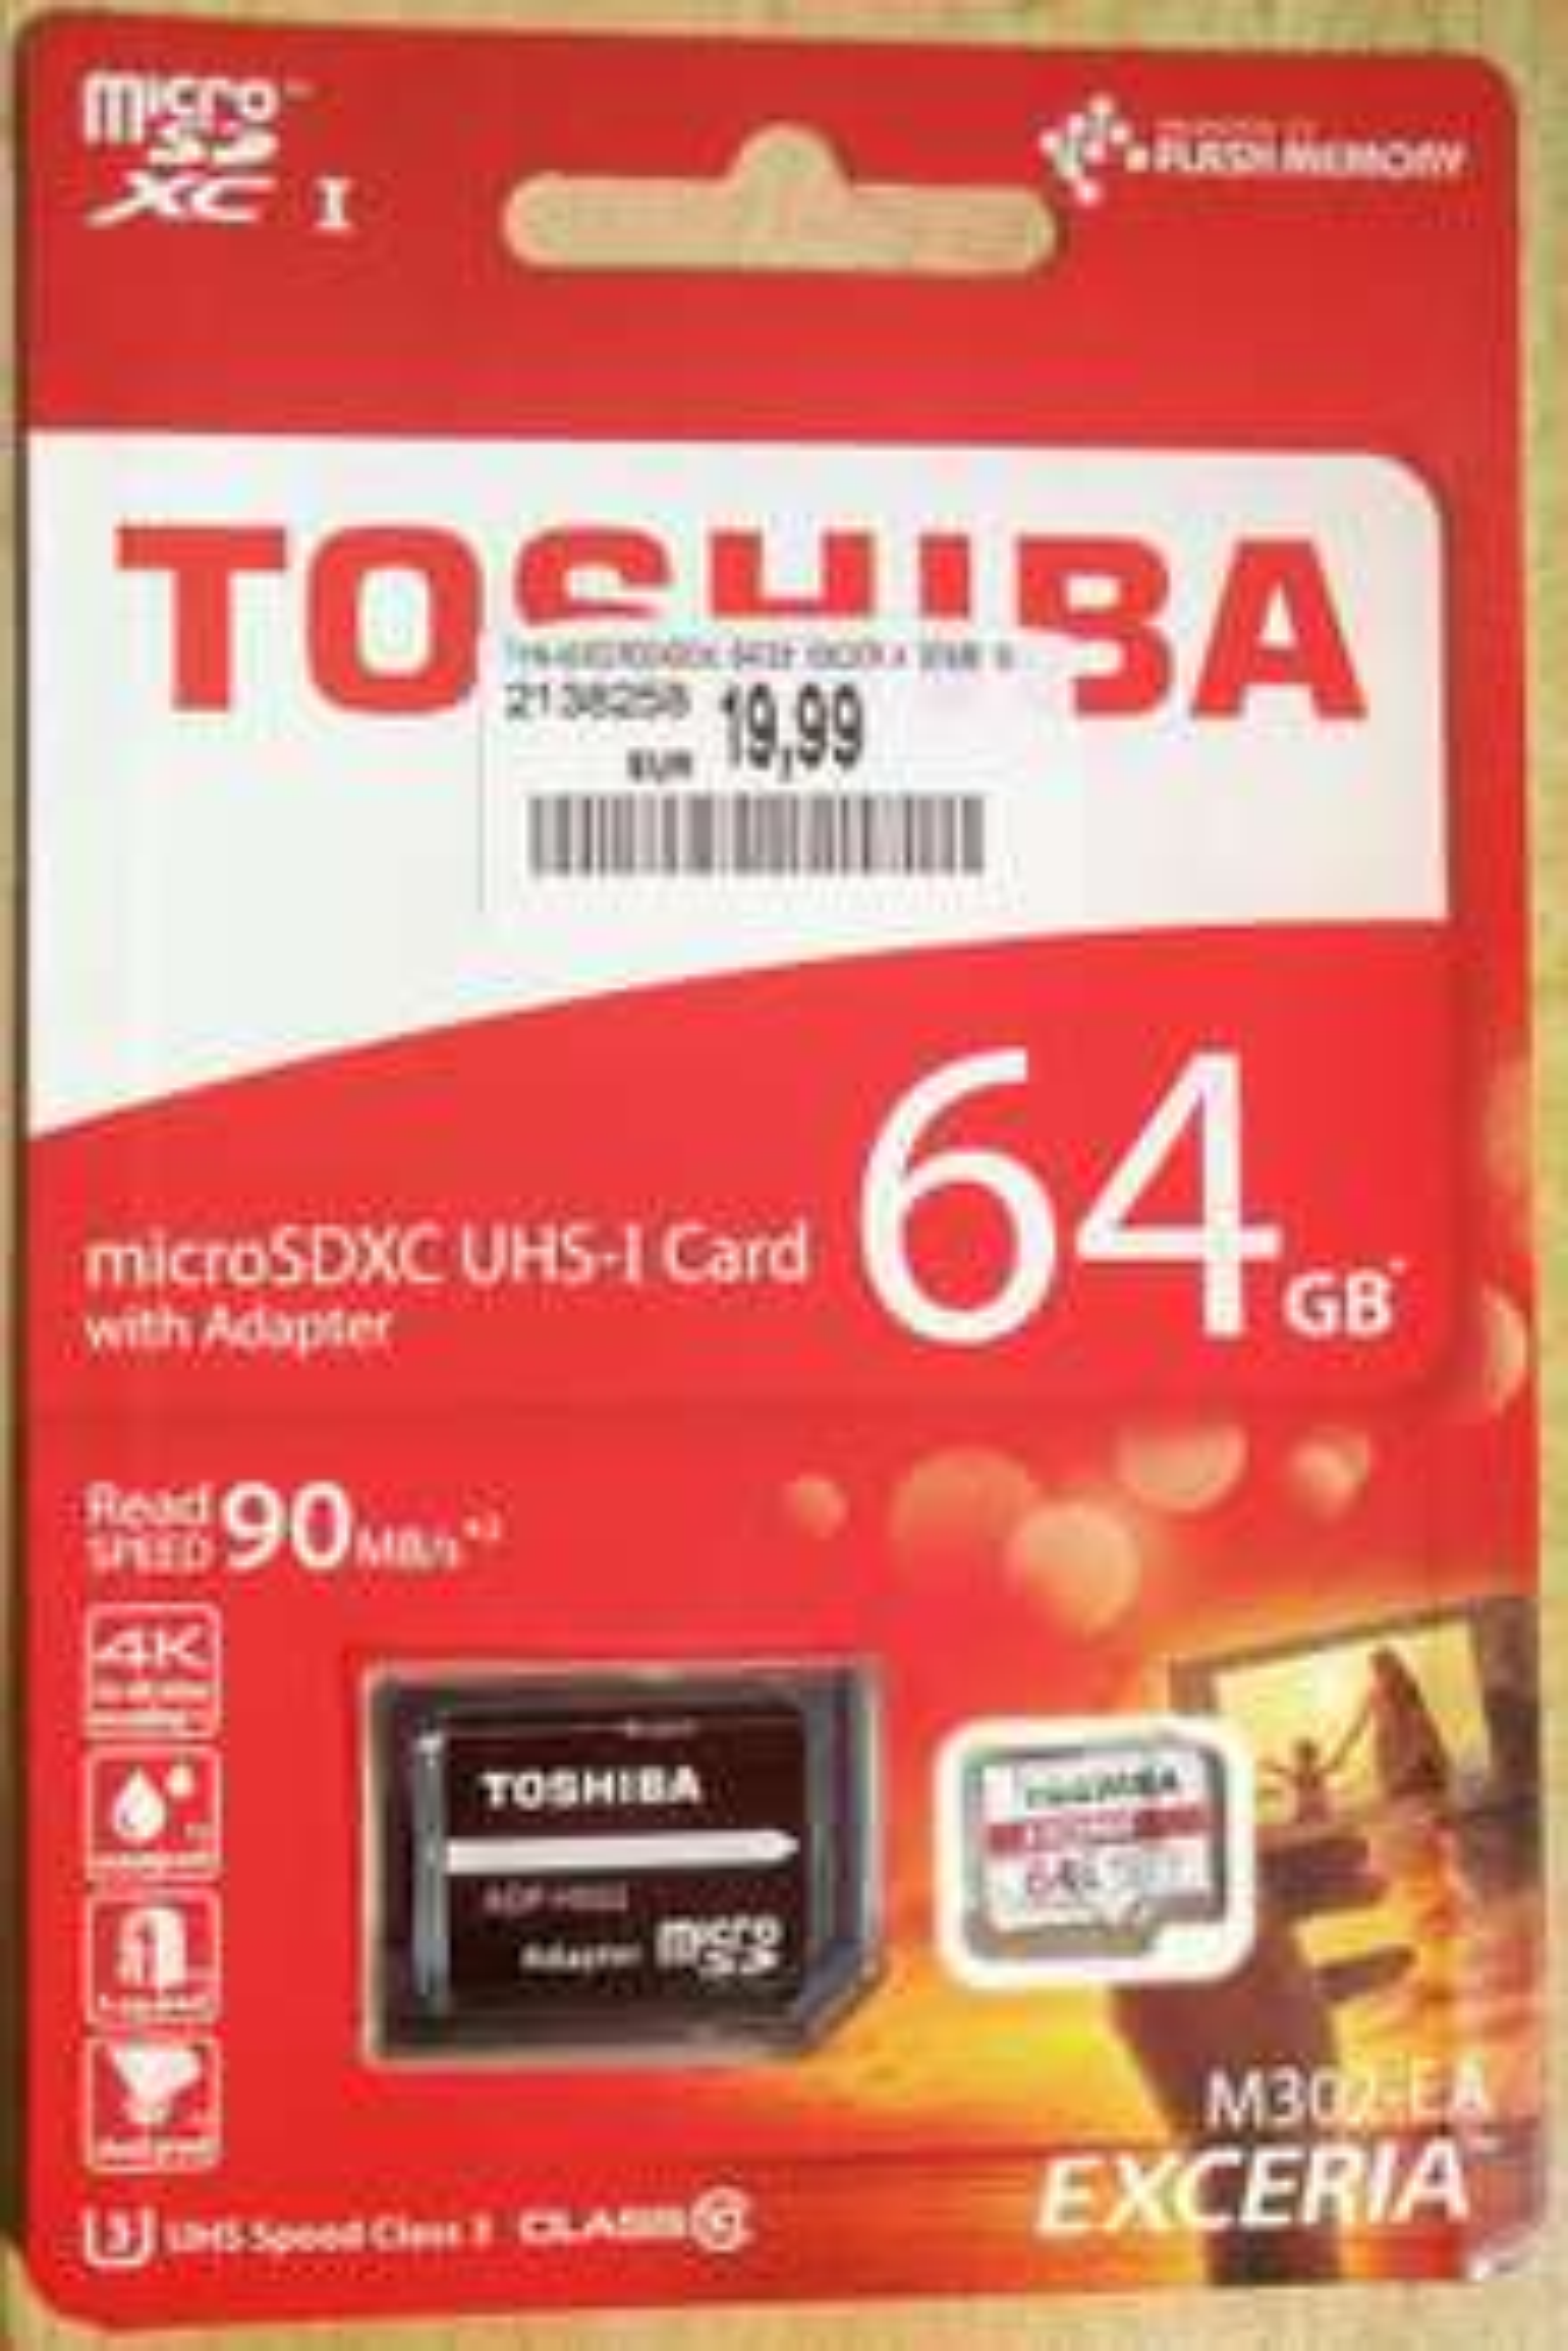 64GB SD-Karte: Toshiba EXCERIA M302 90mb/s readspeed bei Media Markt [offline]